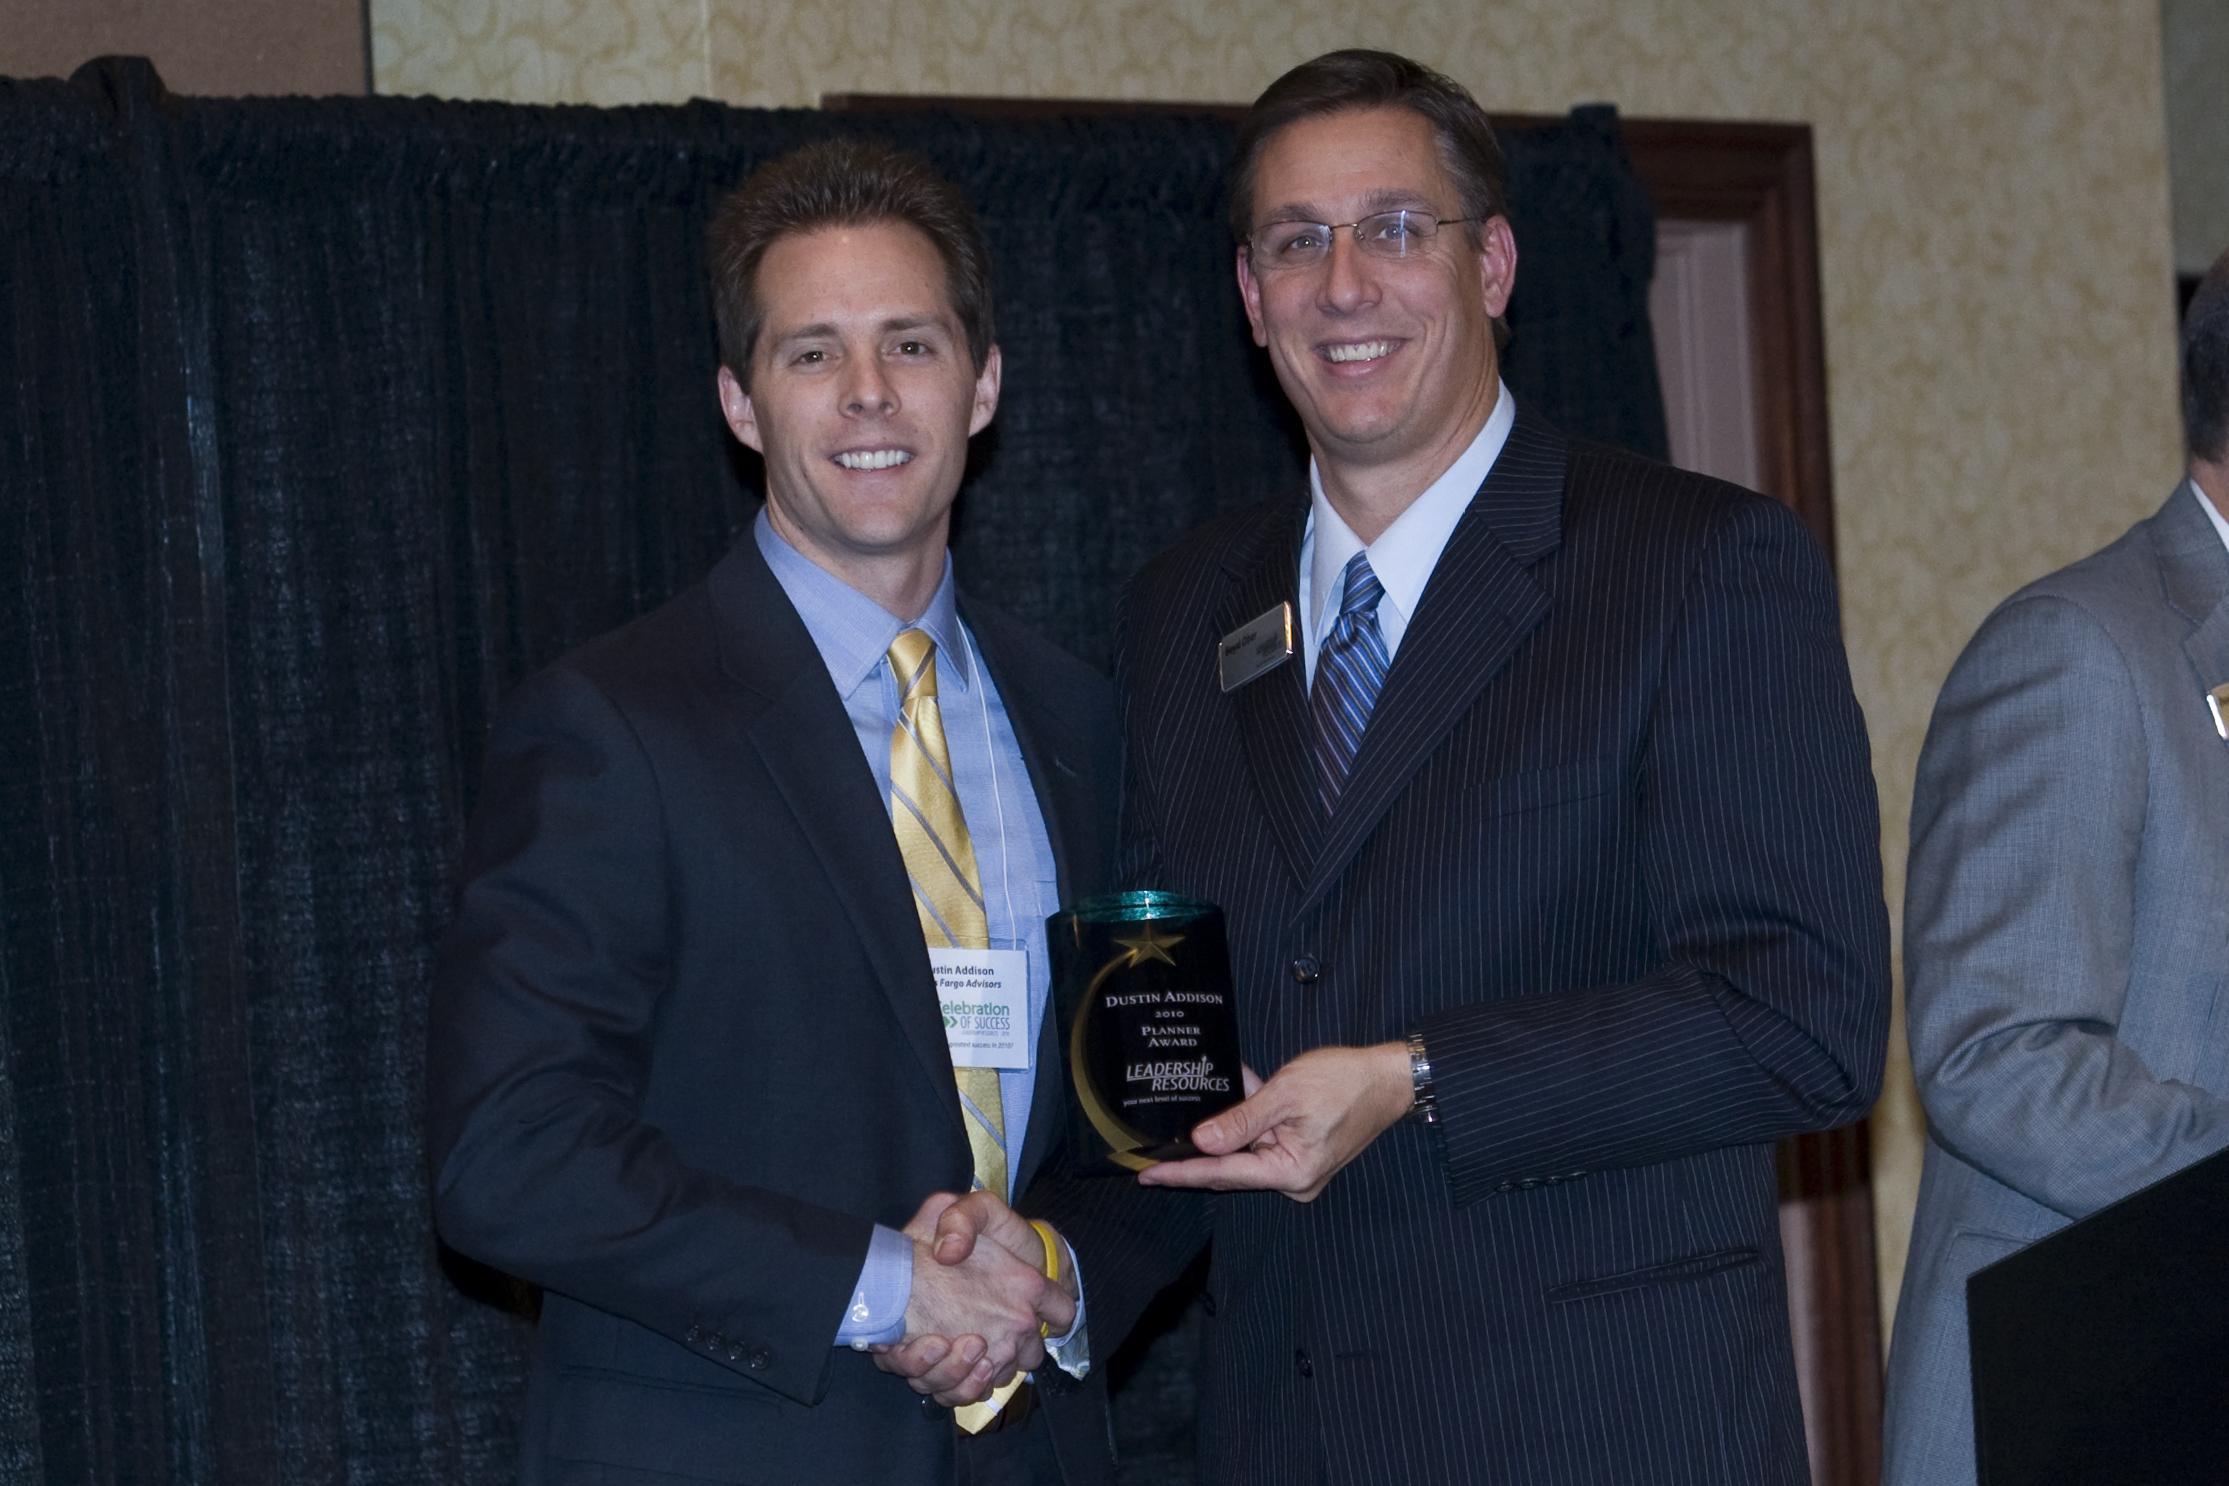 Leadership Resources Dustin Addison Award Winner The Planner 2010